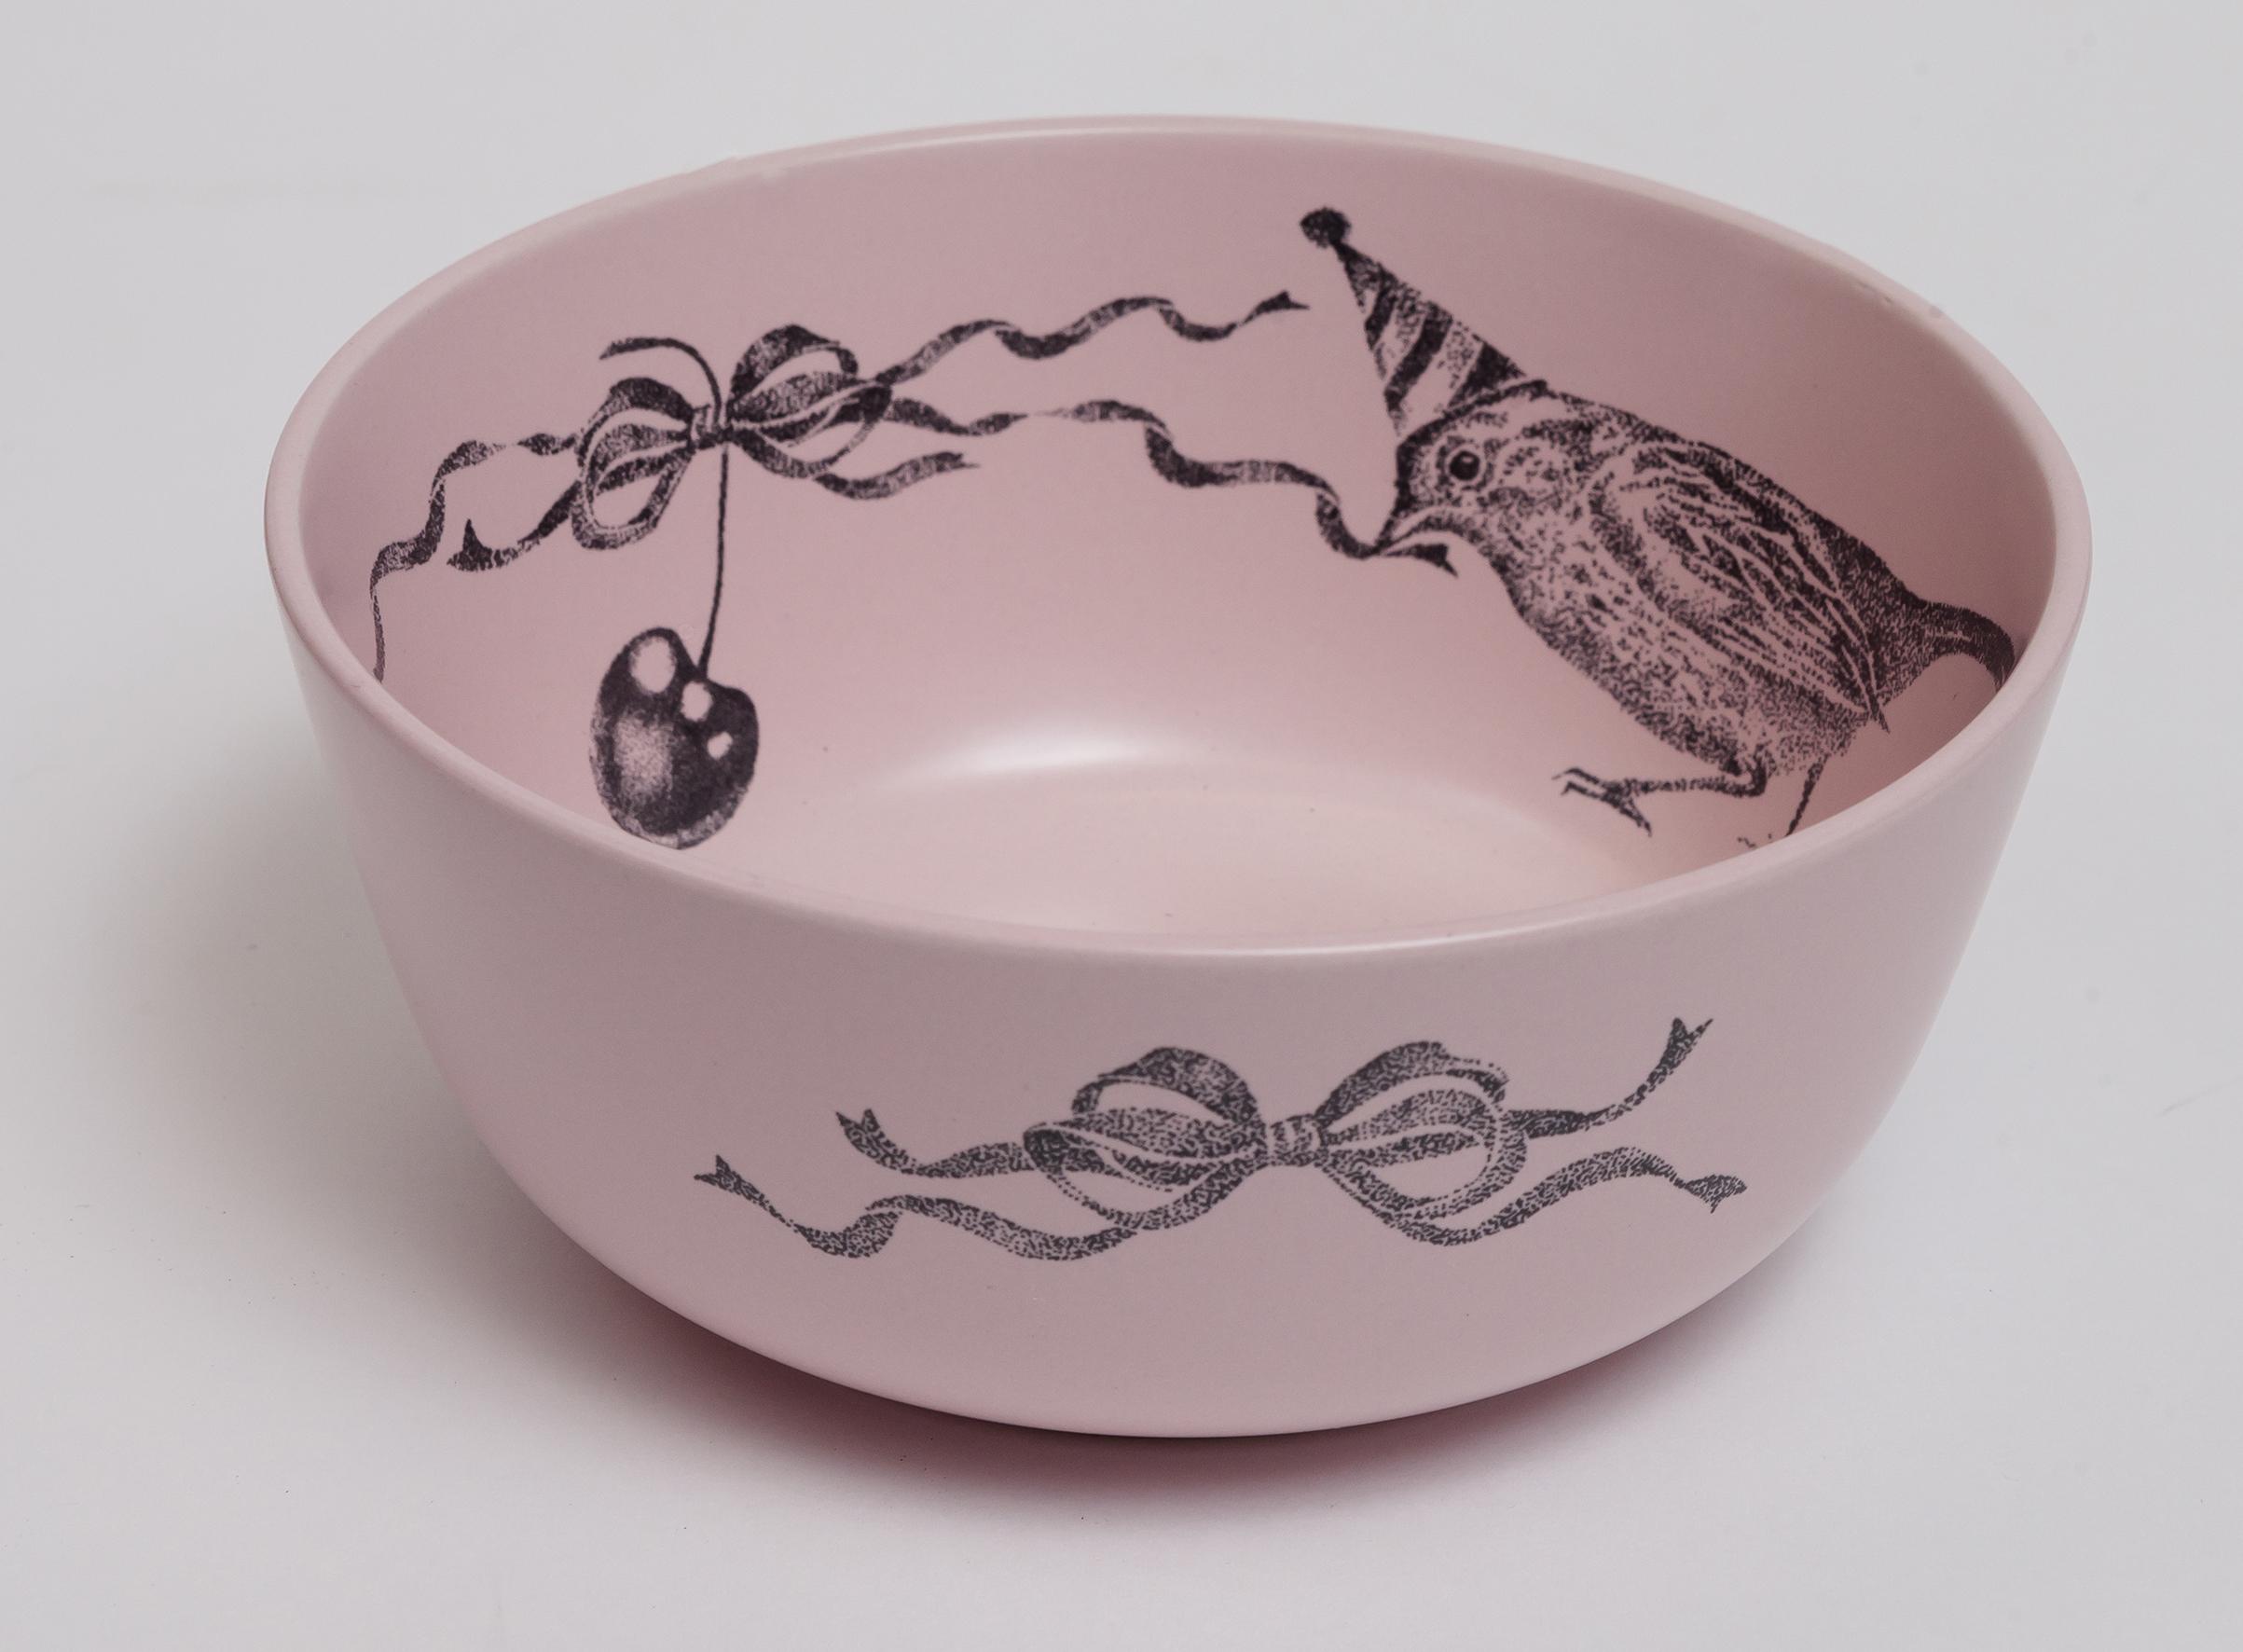 La vie en rose bowl